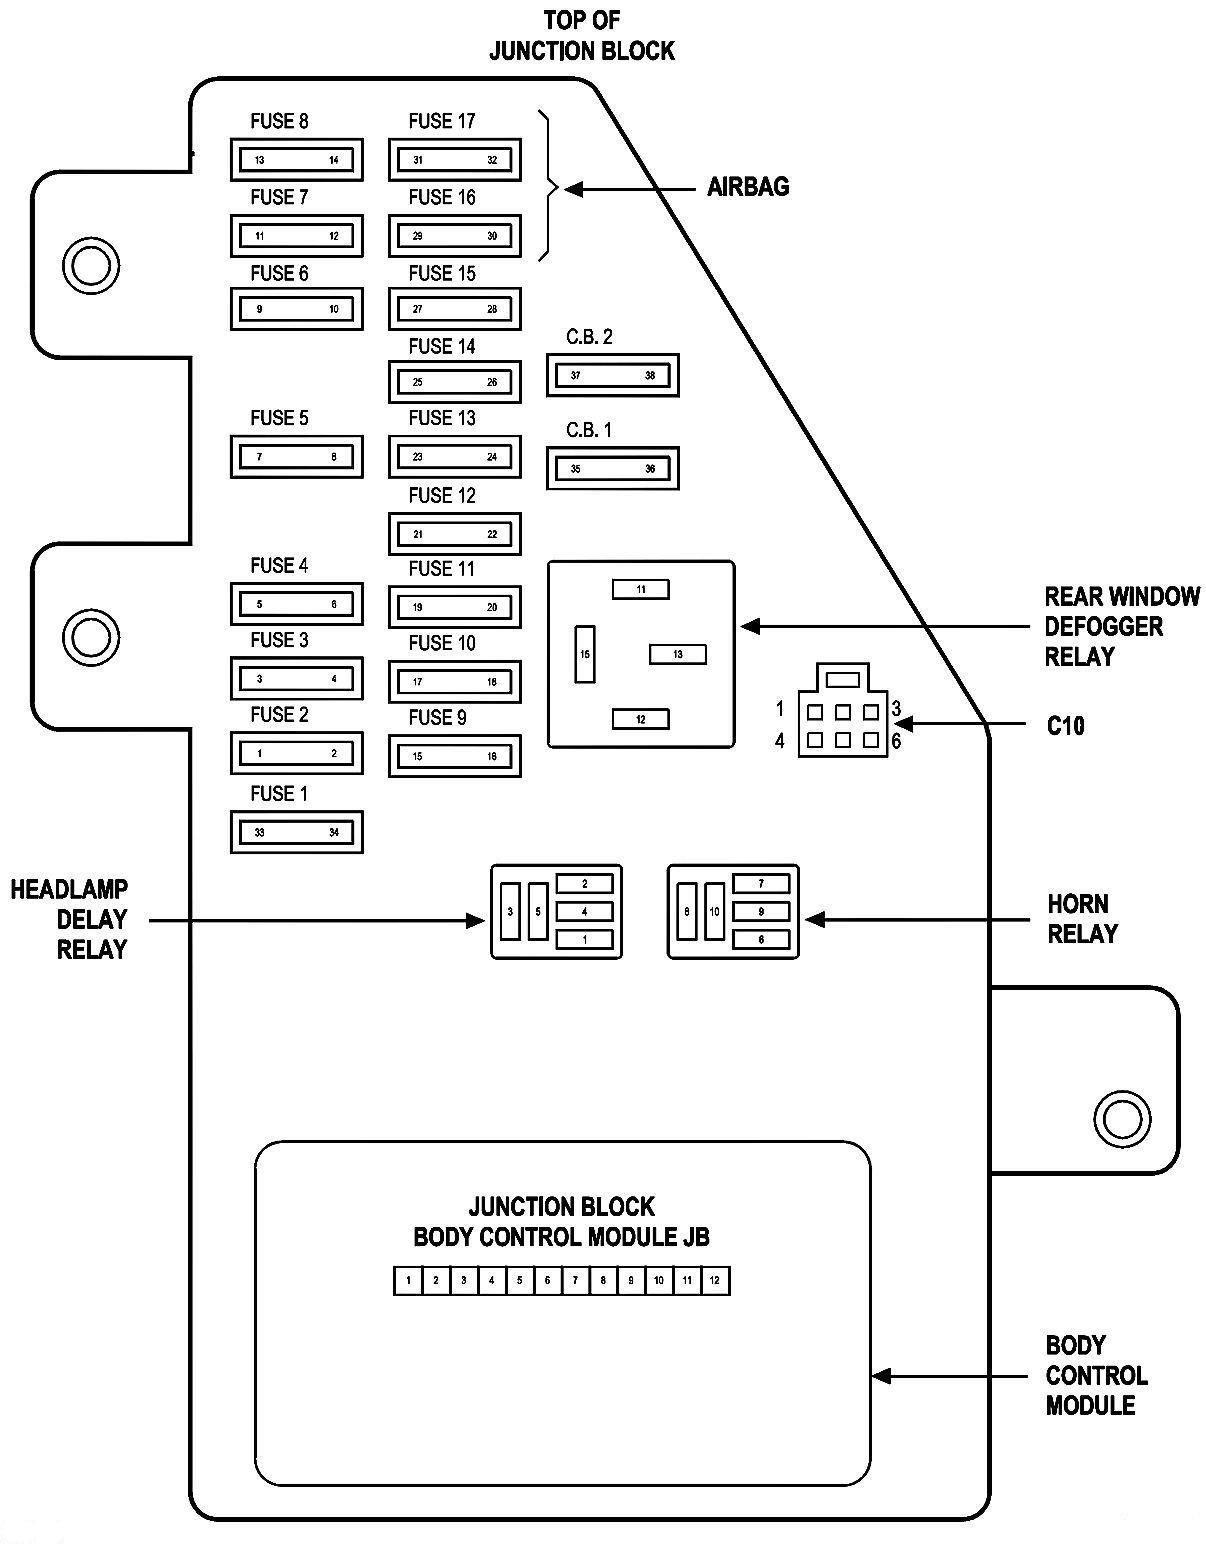 2007 chrysler sebring fuse box map wiring diagram 2007 chrysler sebring fuse box diagram 8 1 classroomleader co \\u2022